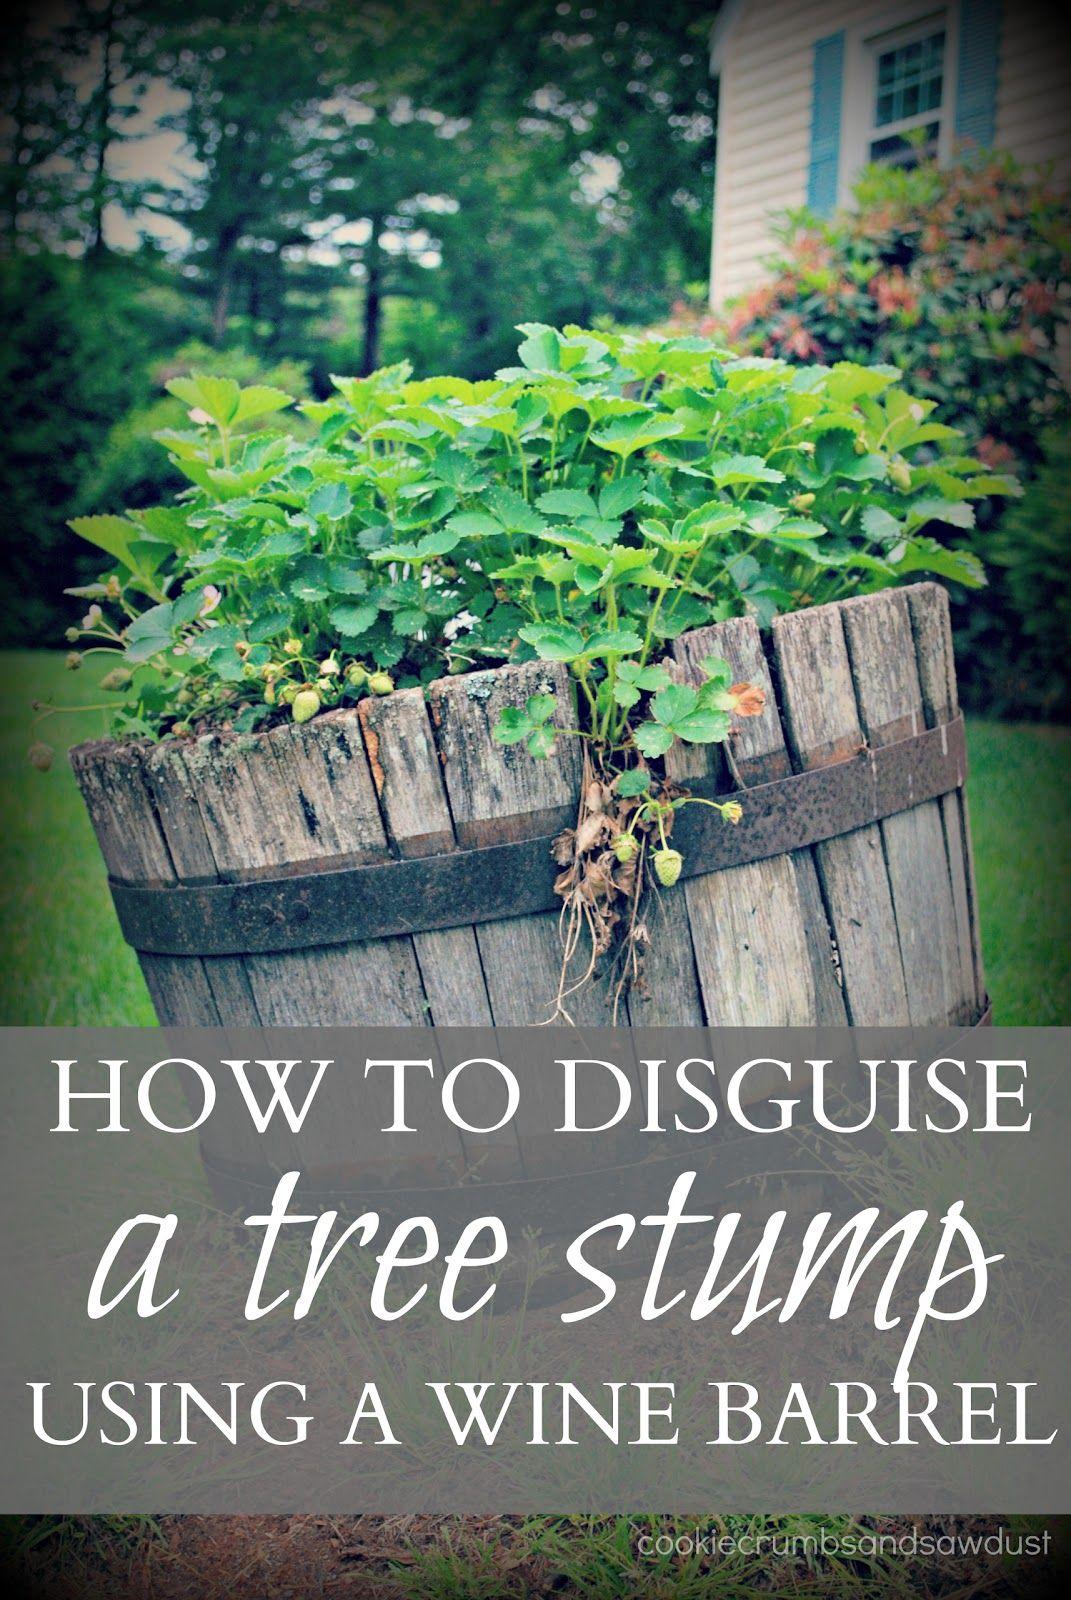 How To Disguise A Tree Stump Tree Stump Decor Tree Stump Tree